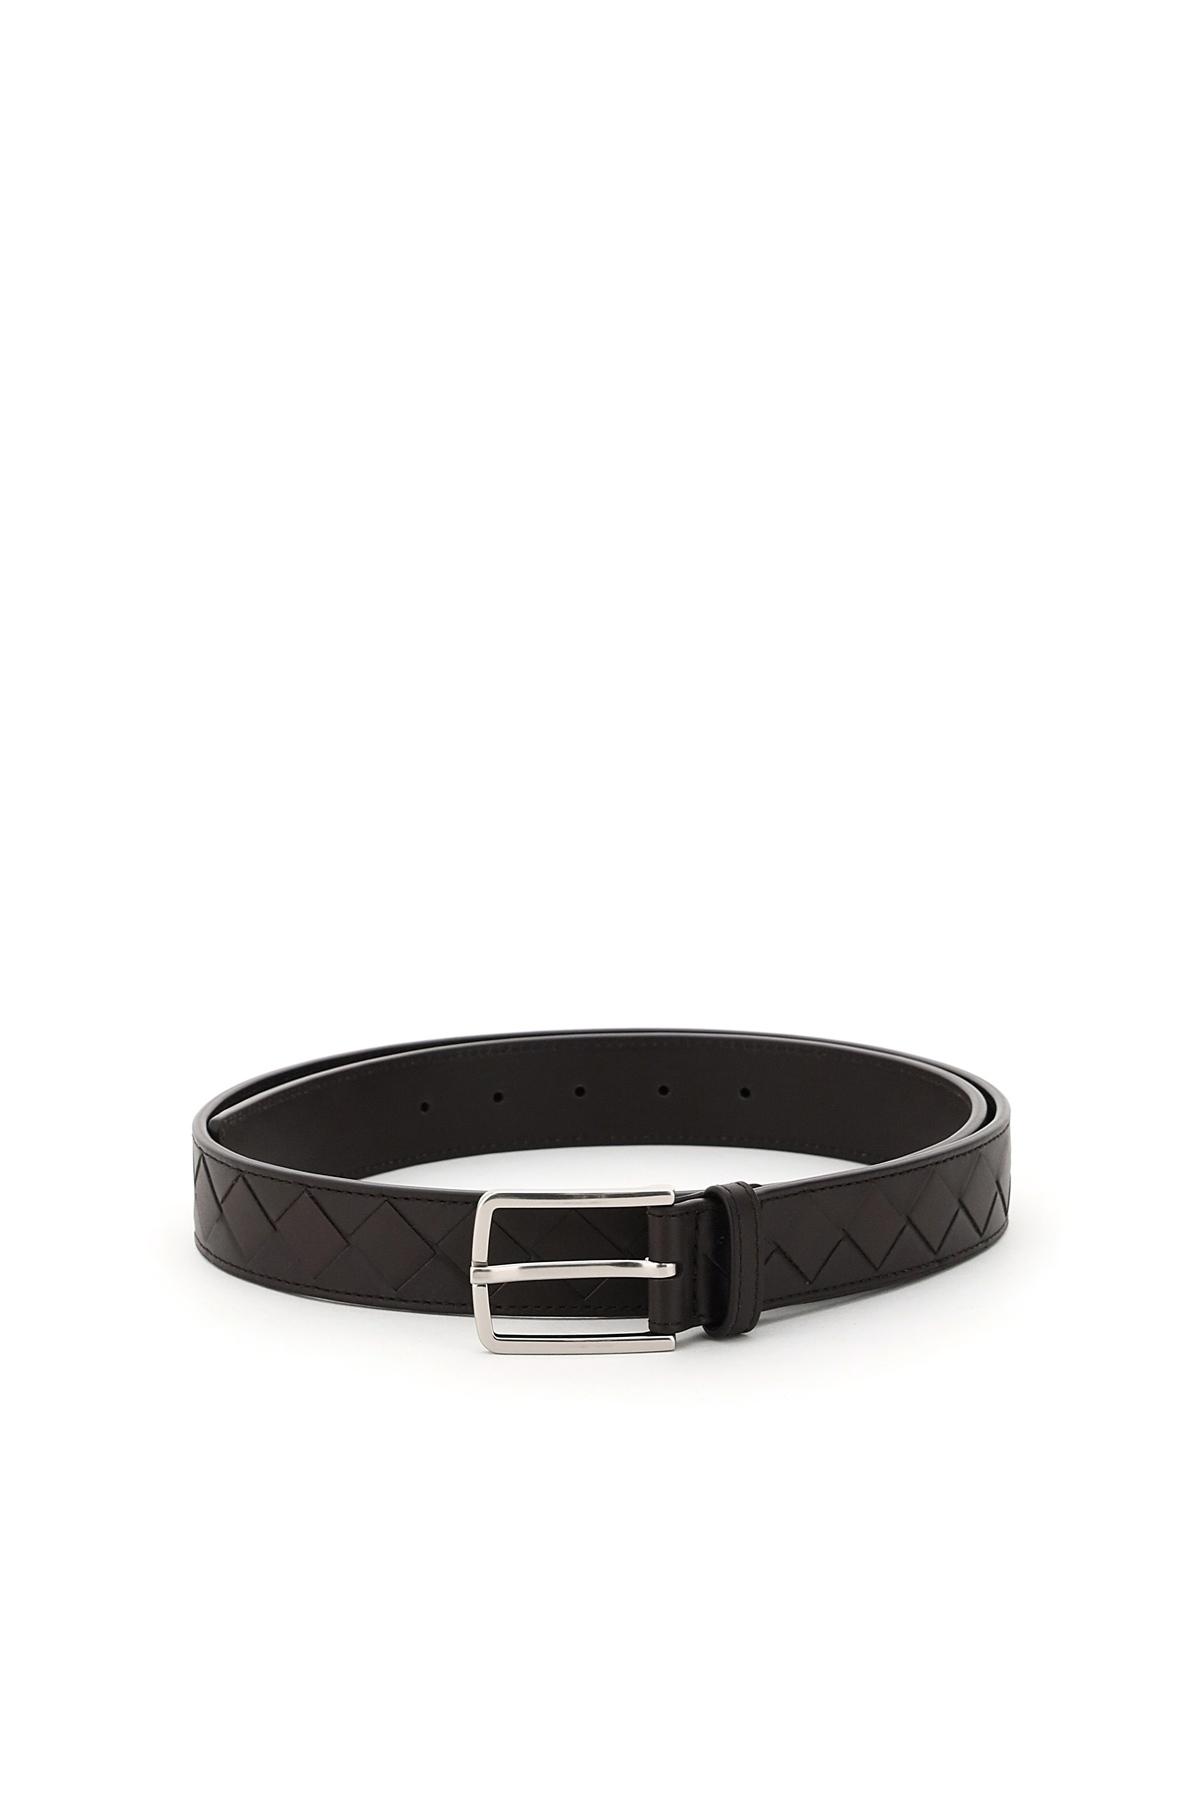 BOTTEGA VENETA INTRECCIATO 15 BELT 110 Black Leather